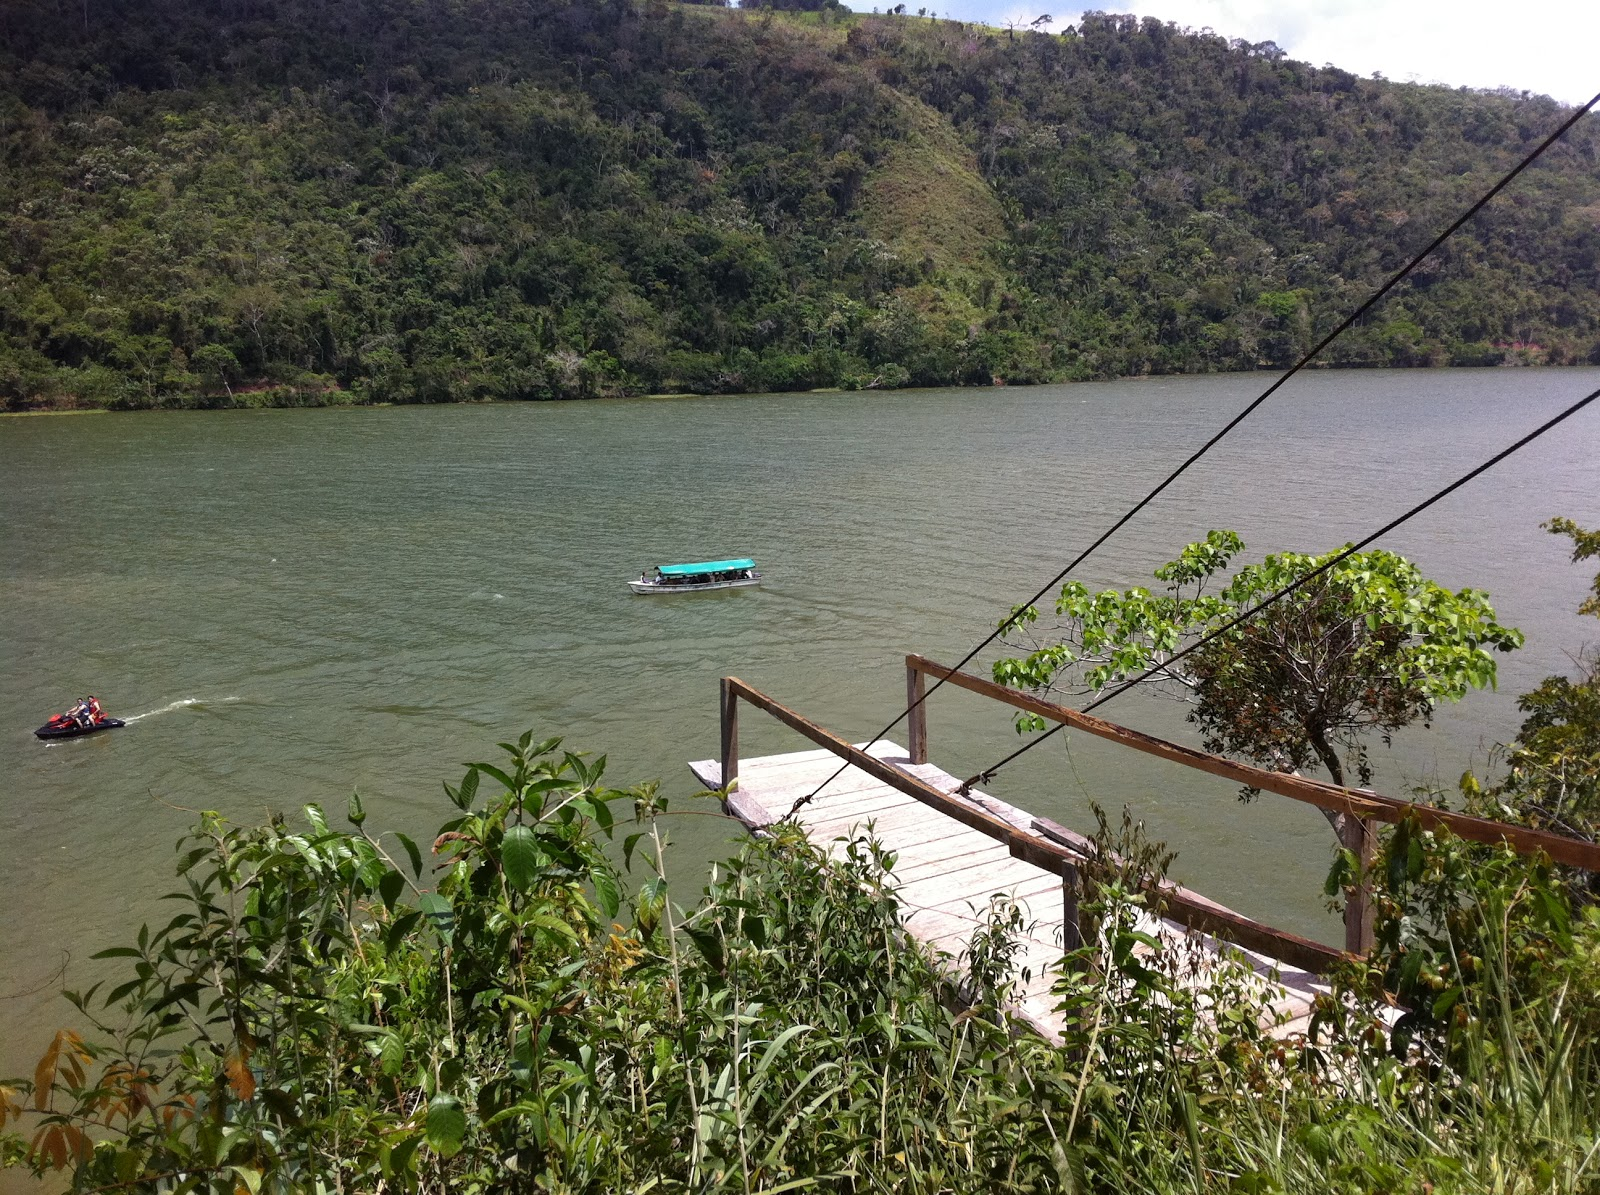 http://thepomegranateway.blogspot.com/2011/11/saucy-lagoon.html